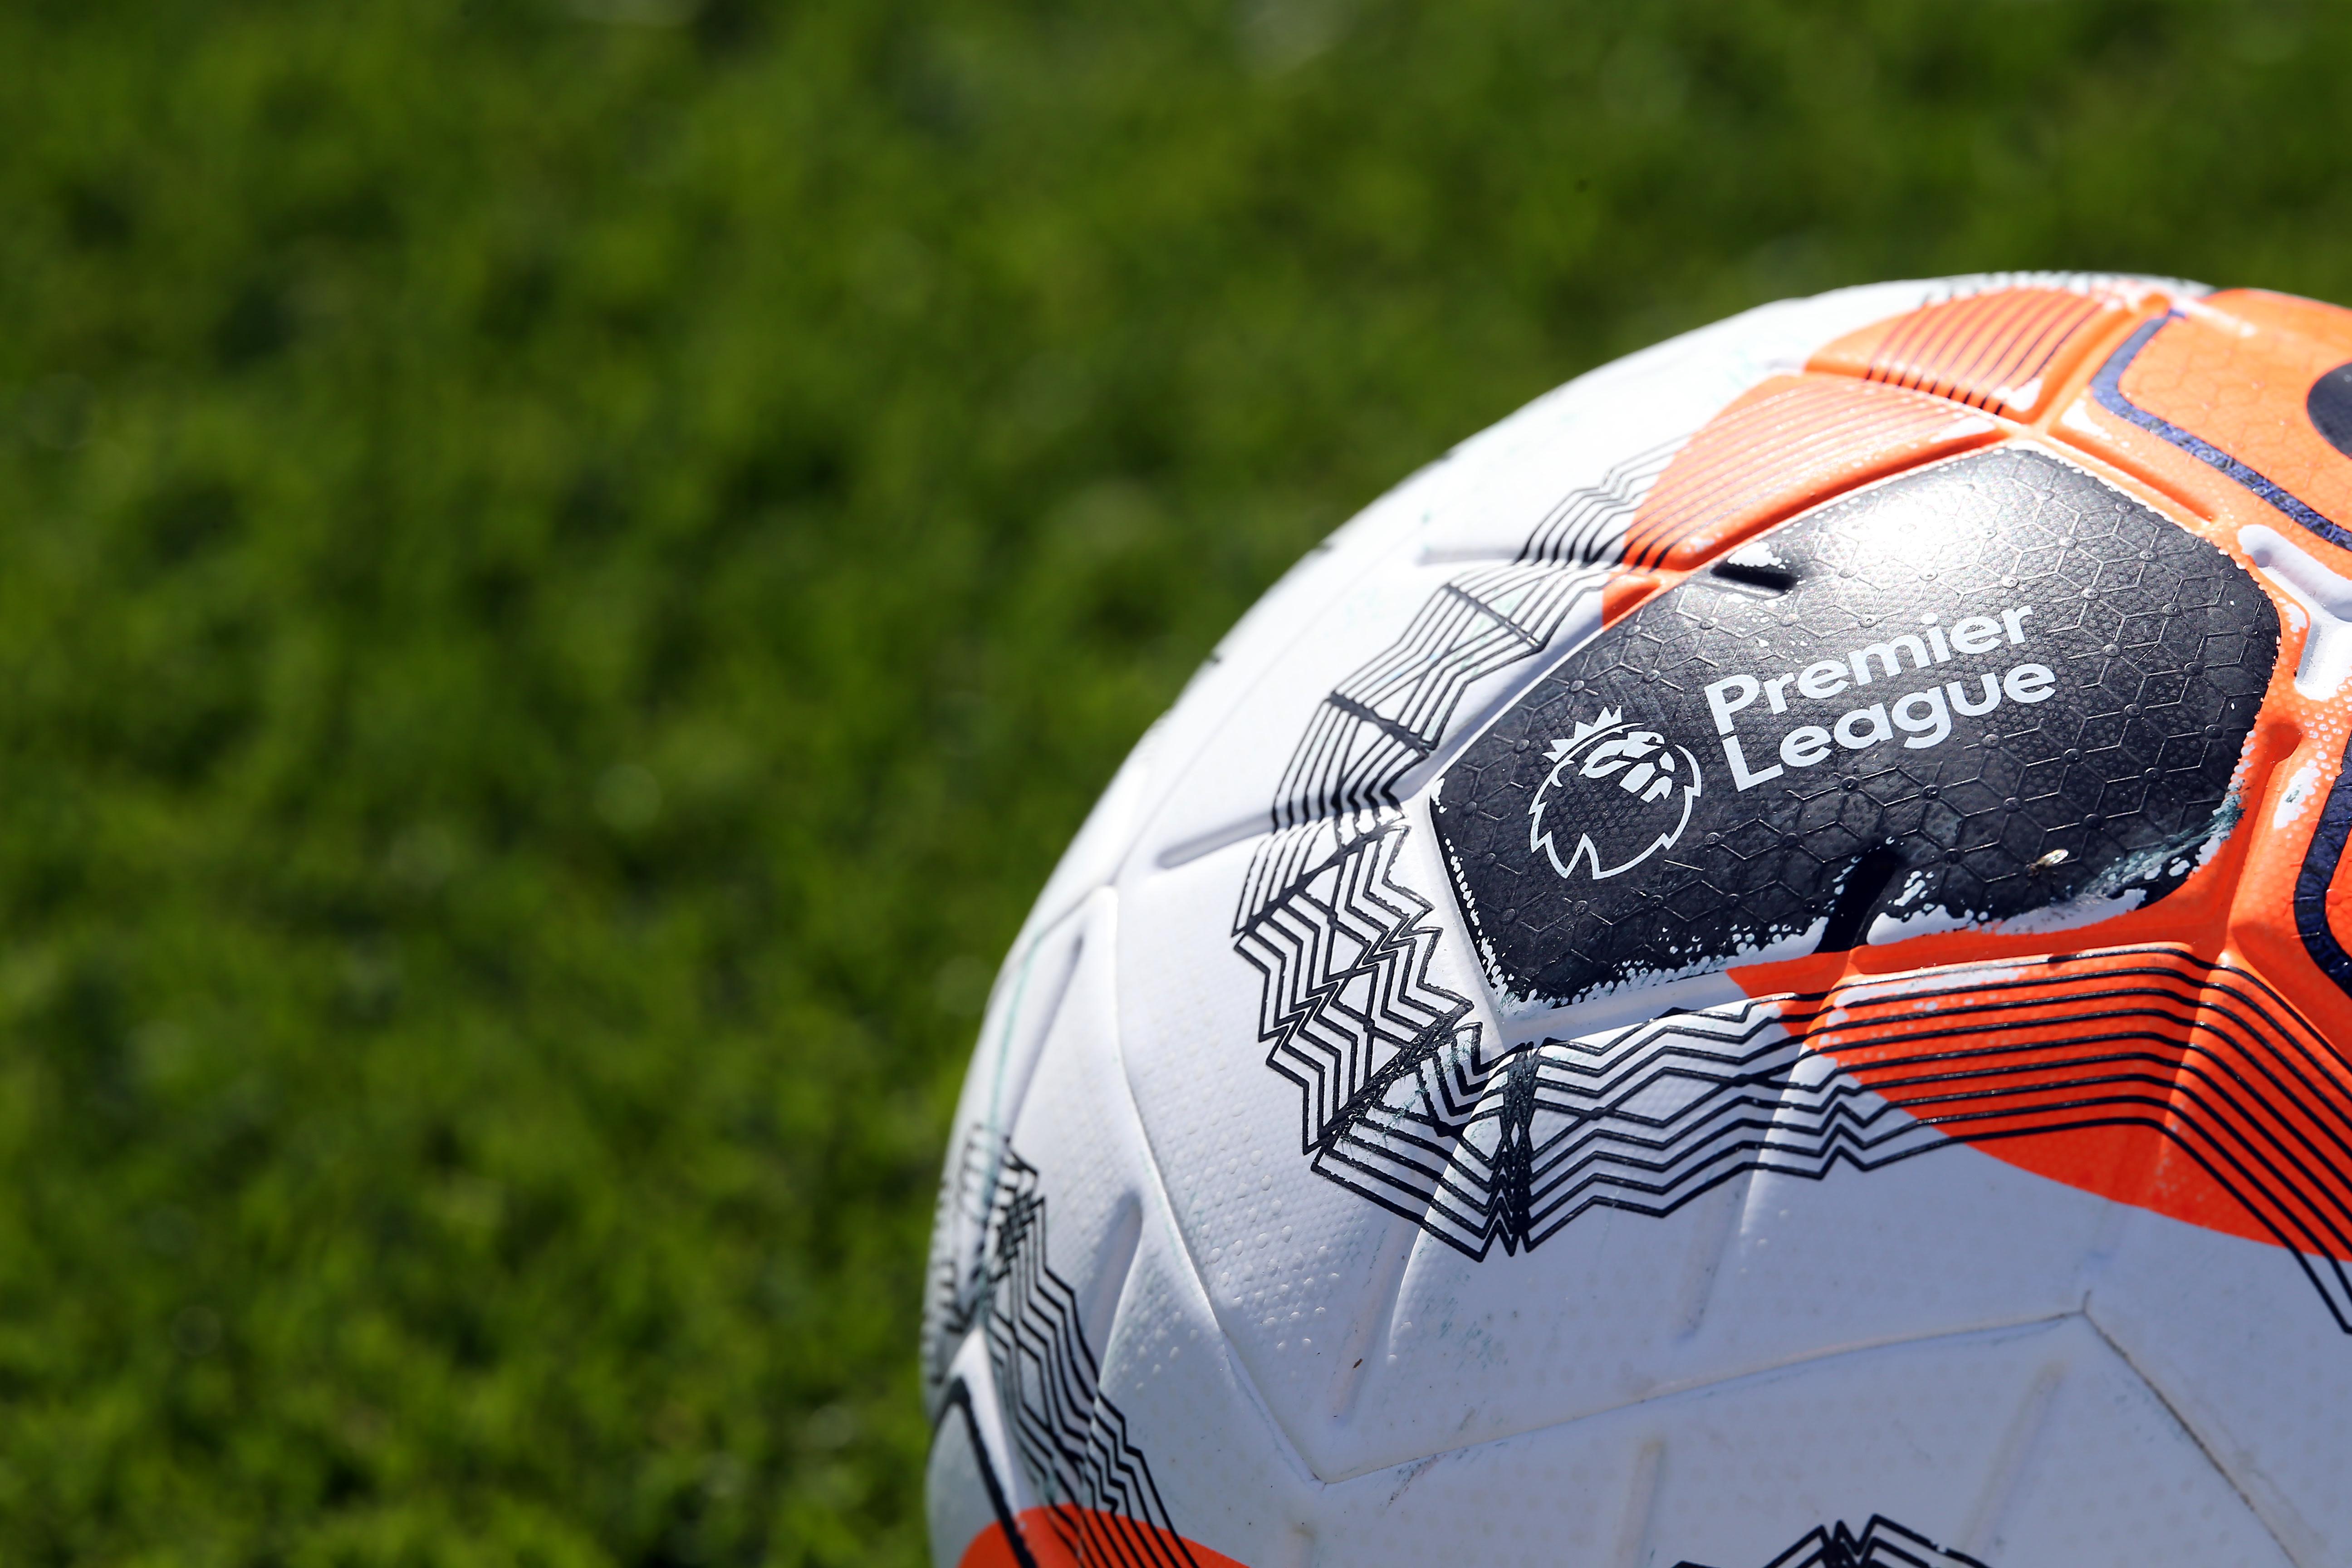 free online premier league football games